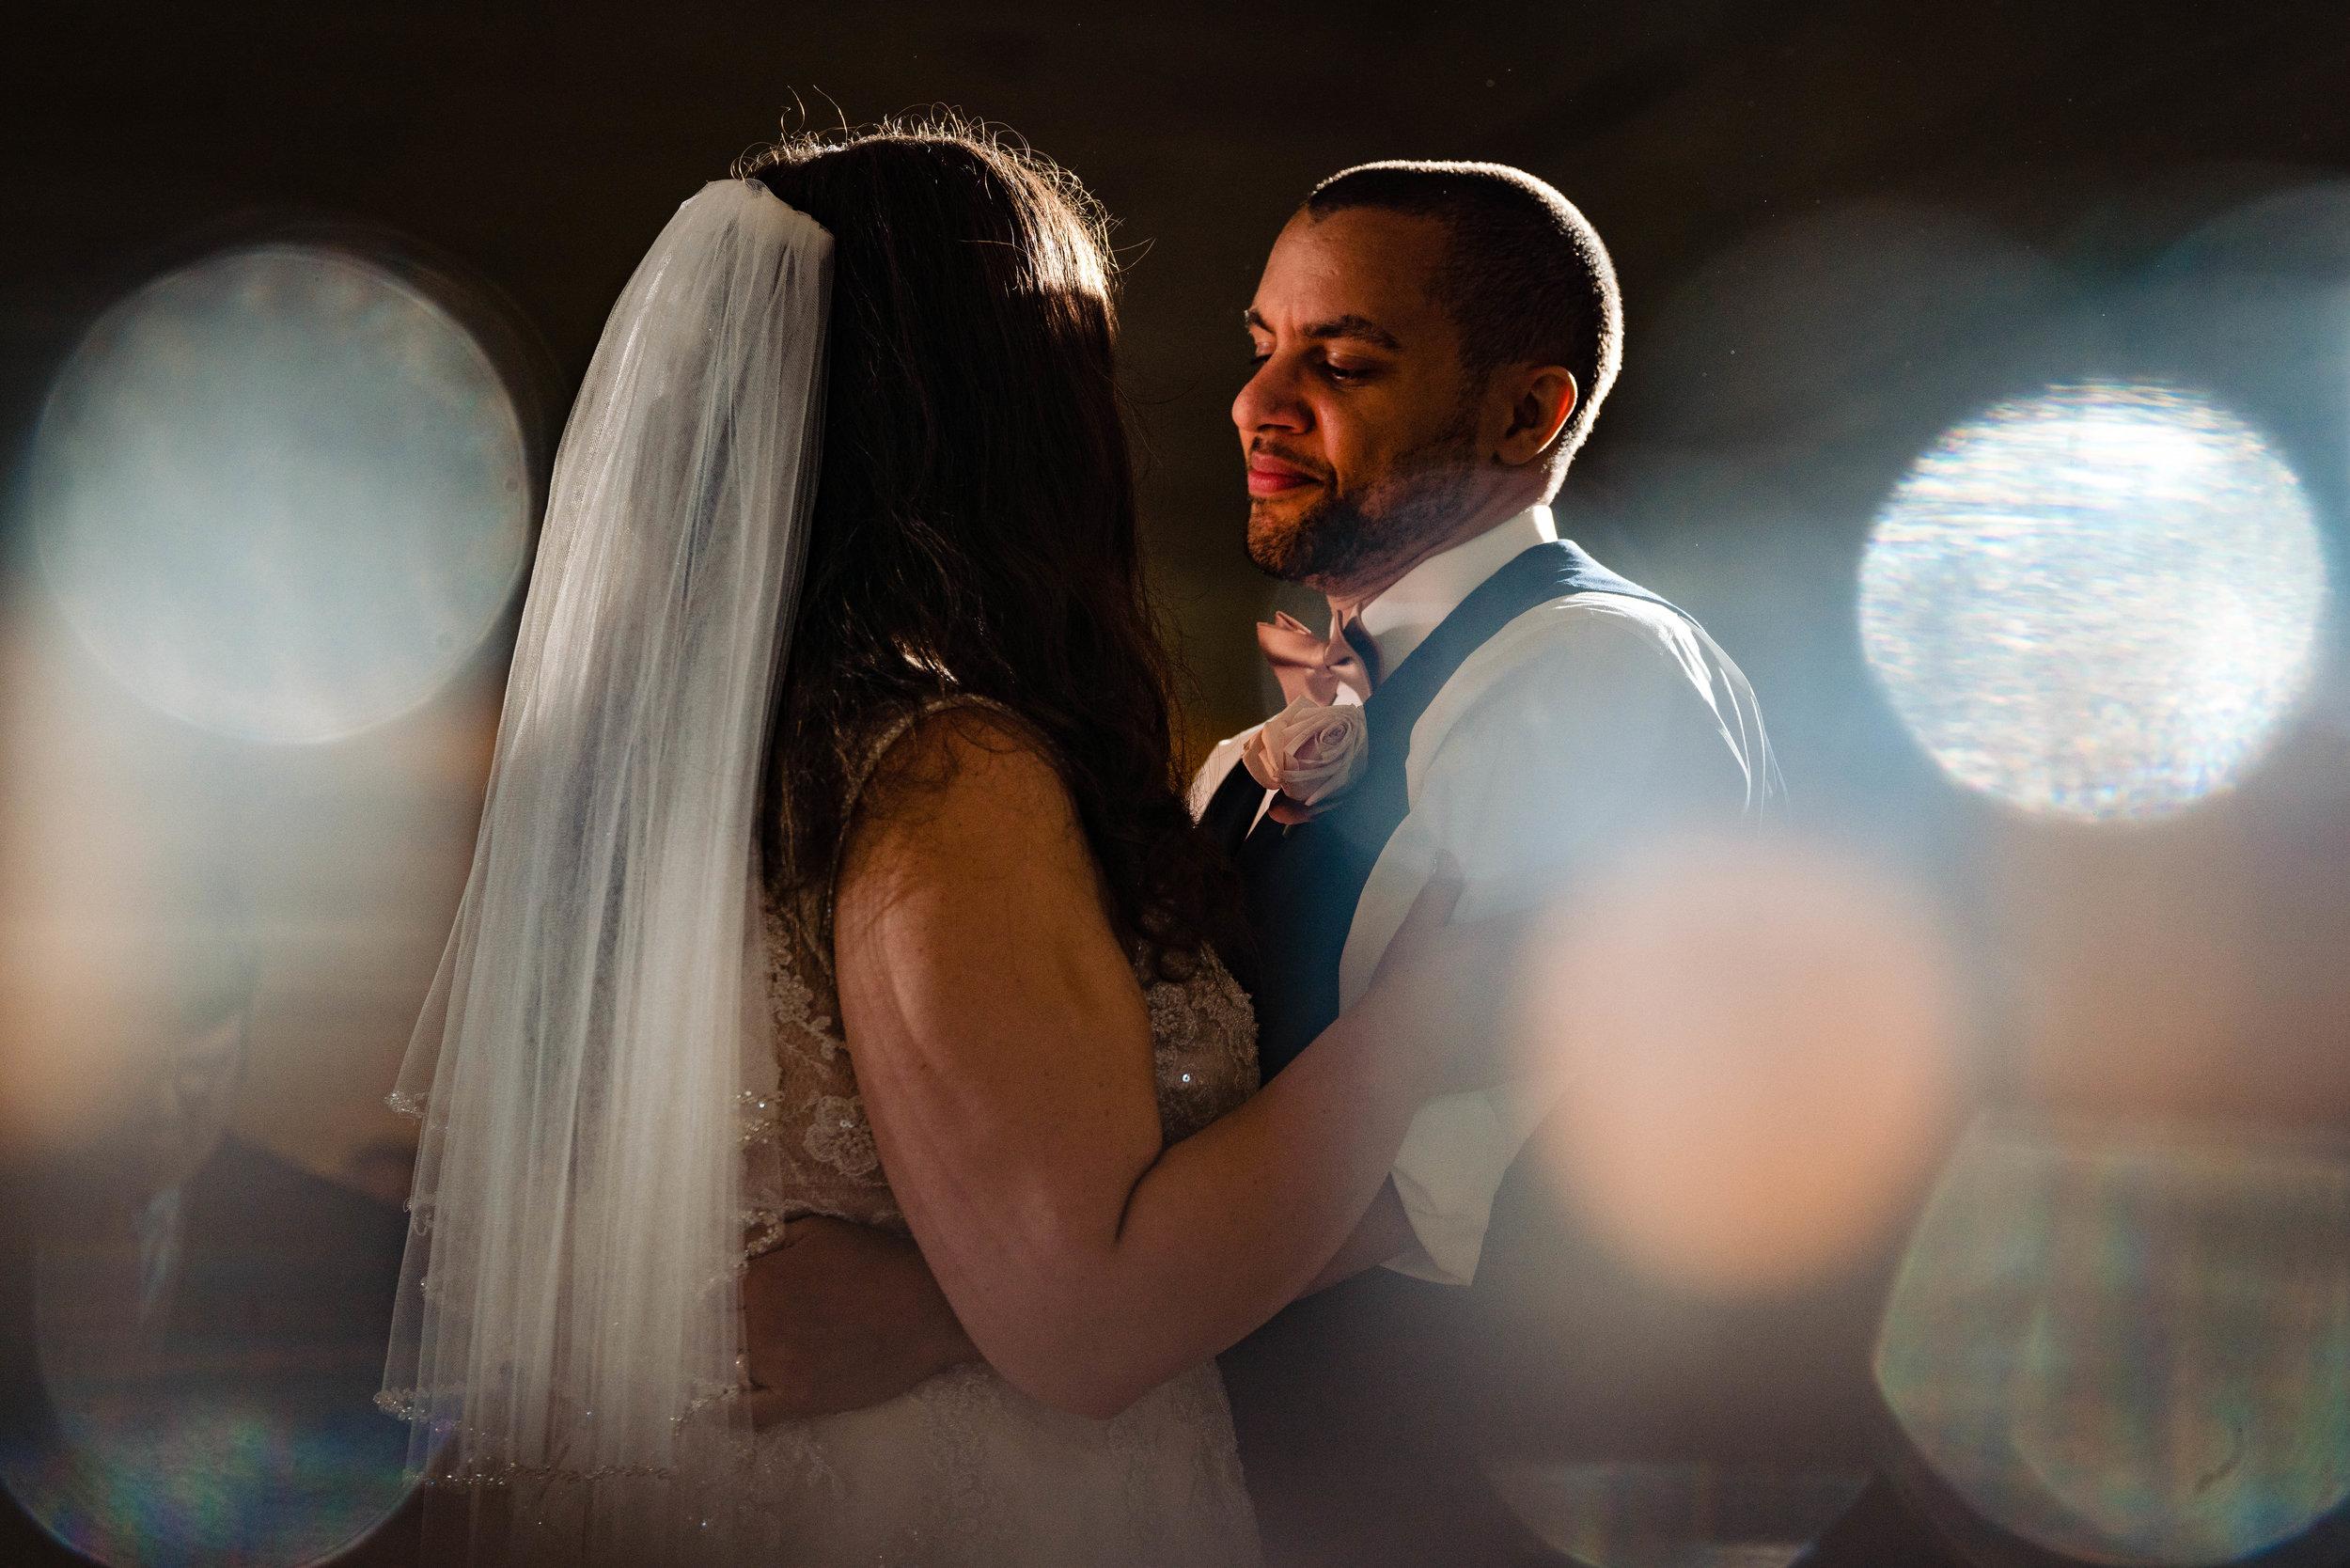 copper-ridge-on-the-neuse-wedding-001tephanie&Roberto-Wedding-513.jpg